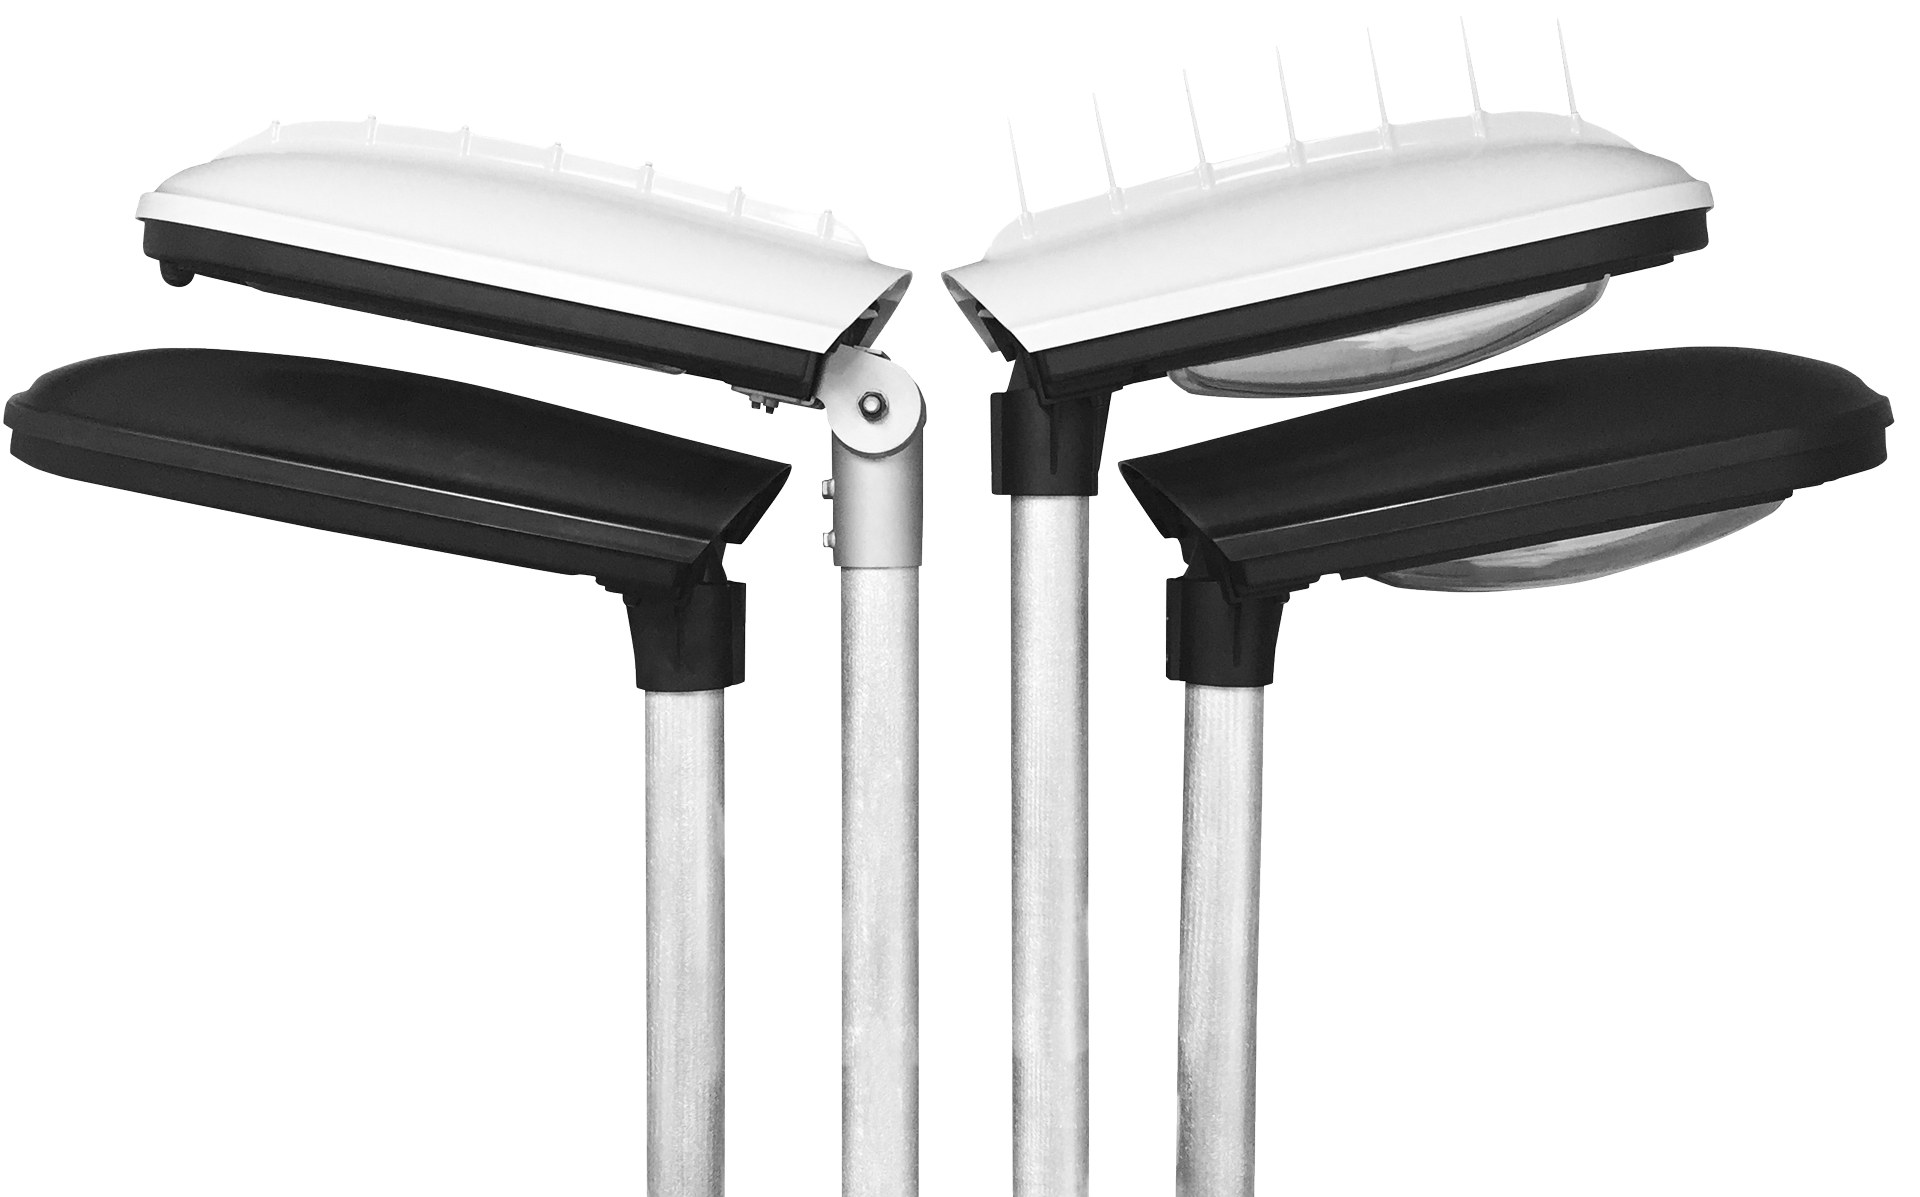 Prisma Tibro, Sweden   Prisma Eliott   Steglös inställning   LED gatubelysning   LED gatubelysning - Kupa eller planglas, Fågelpinnar eller slät kåpa